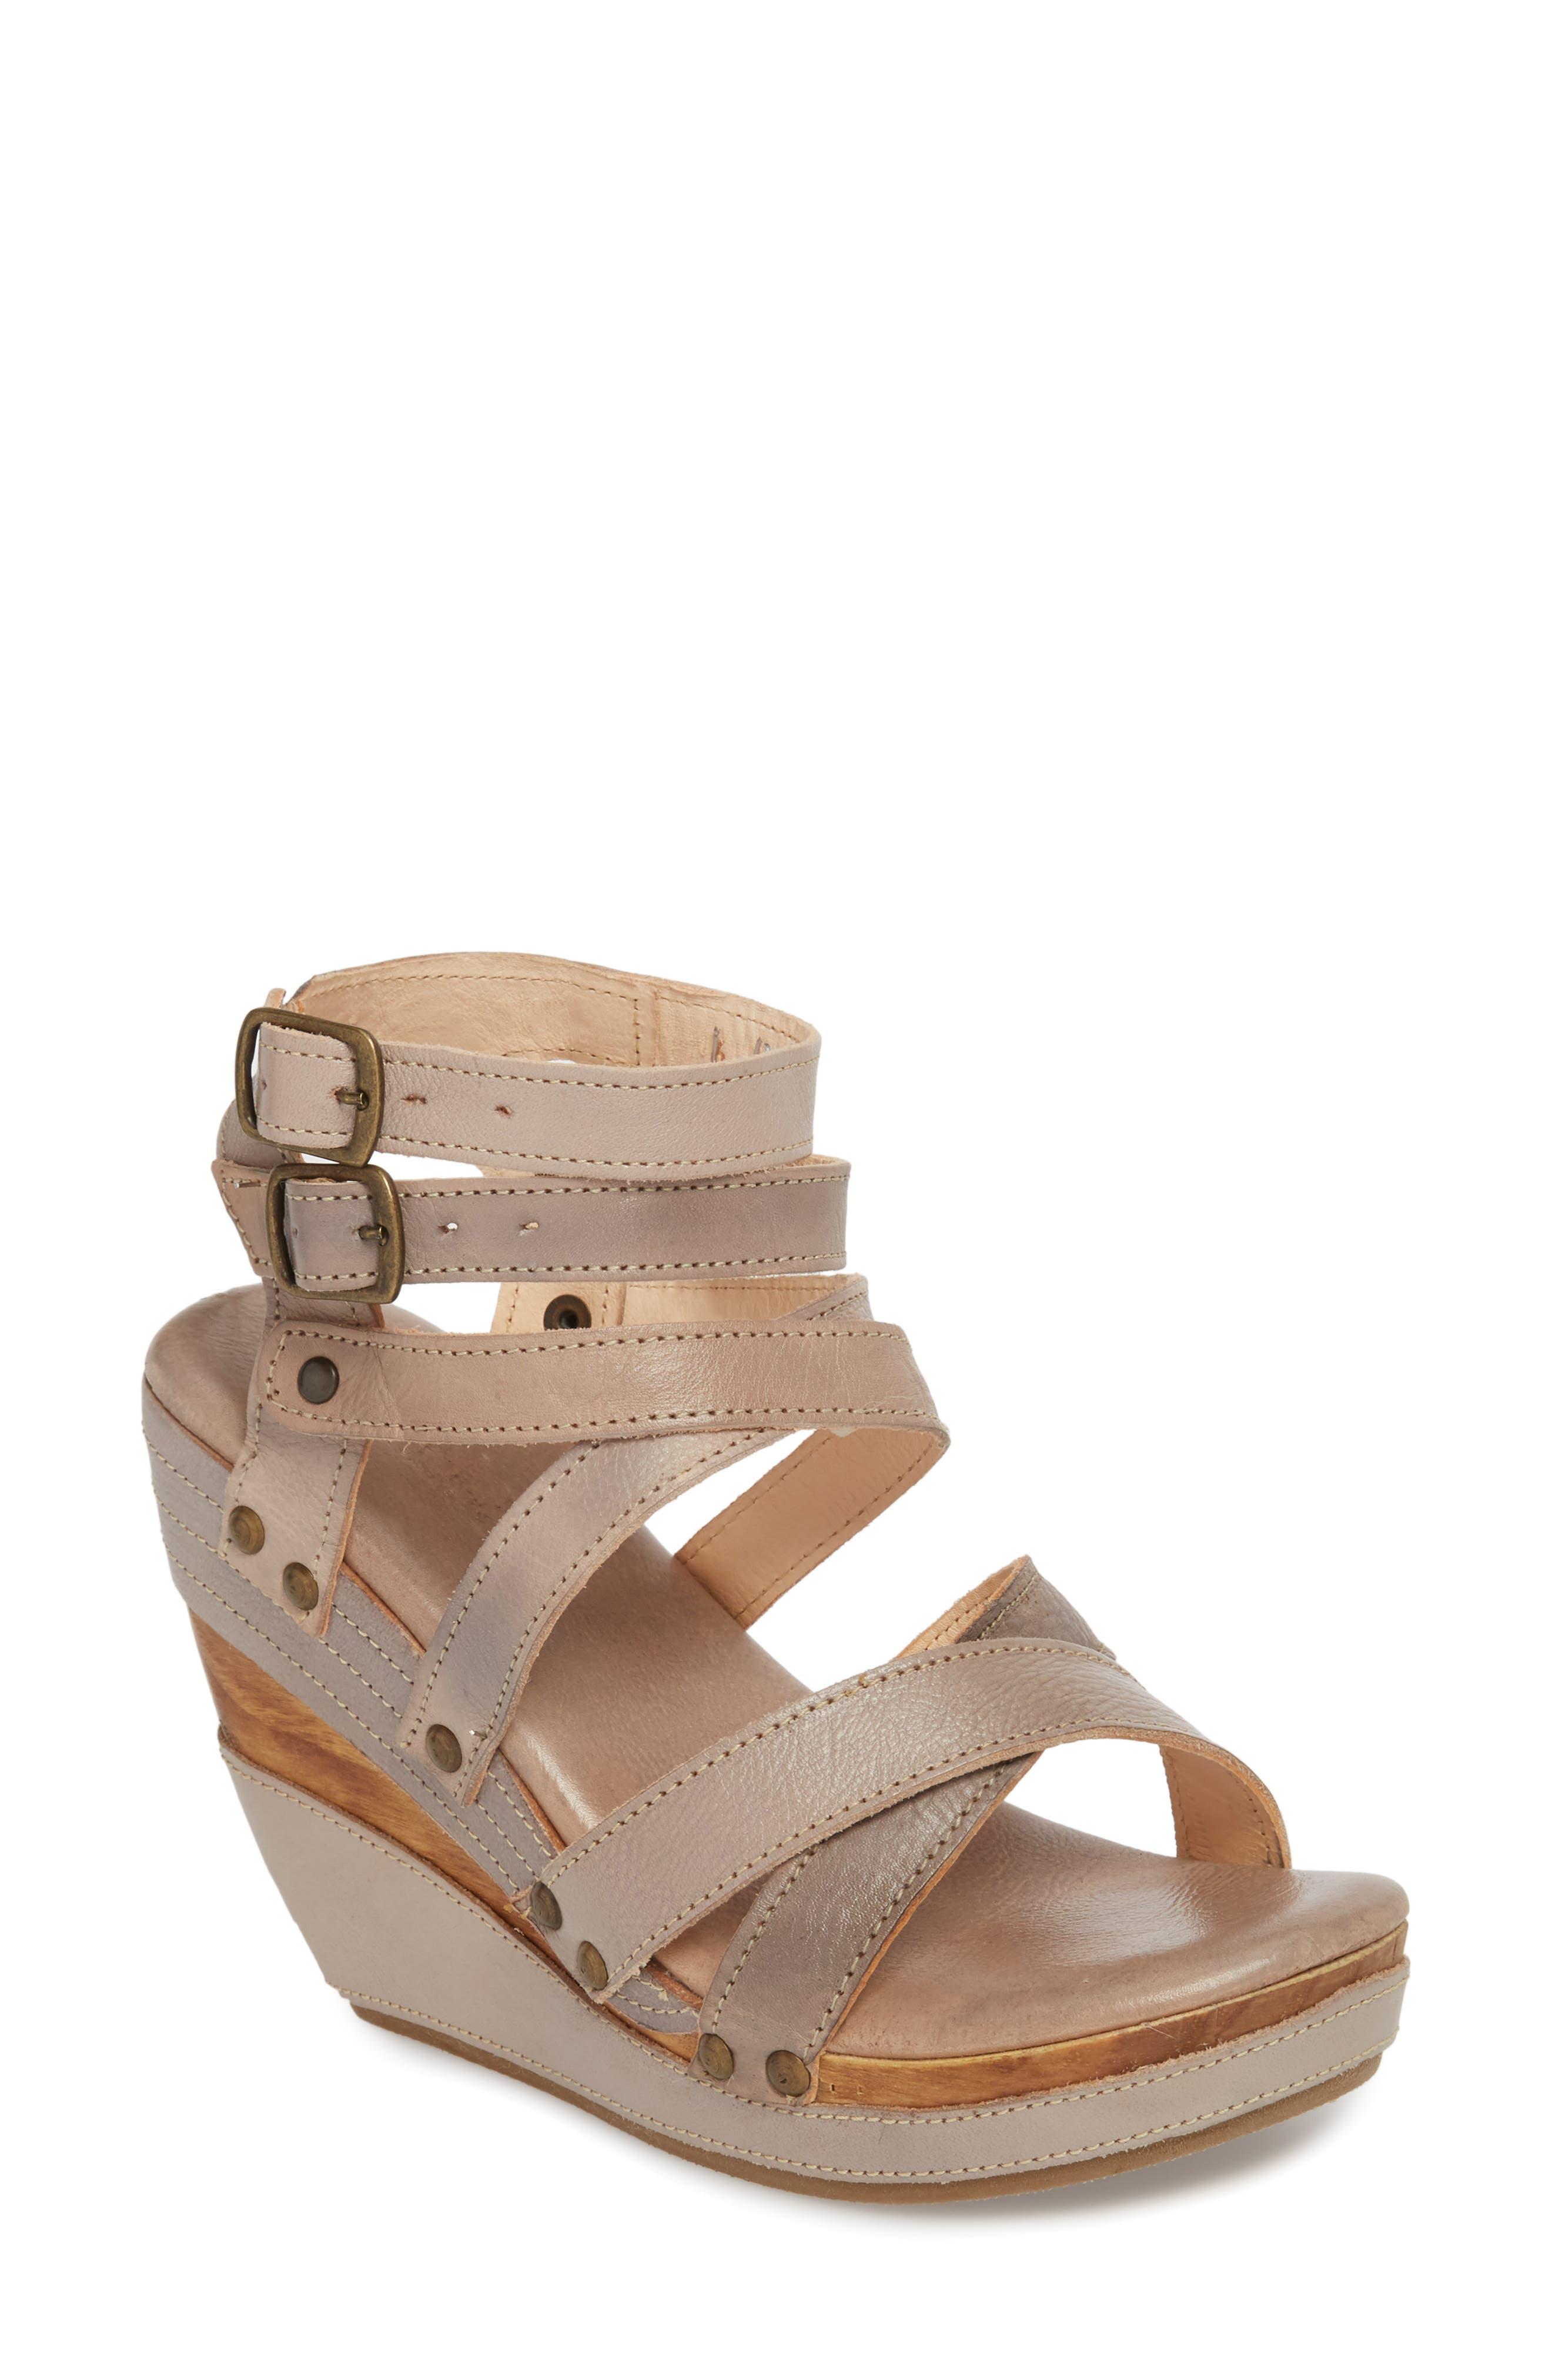 'Juliana' Sandal,                             Main thumbnail 1, color,                             Light Grey Leather